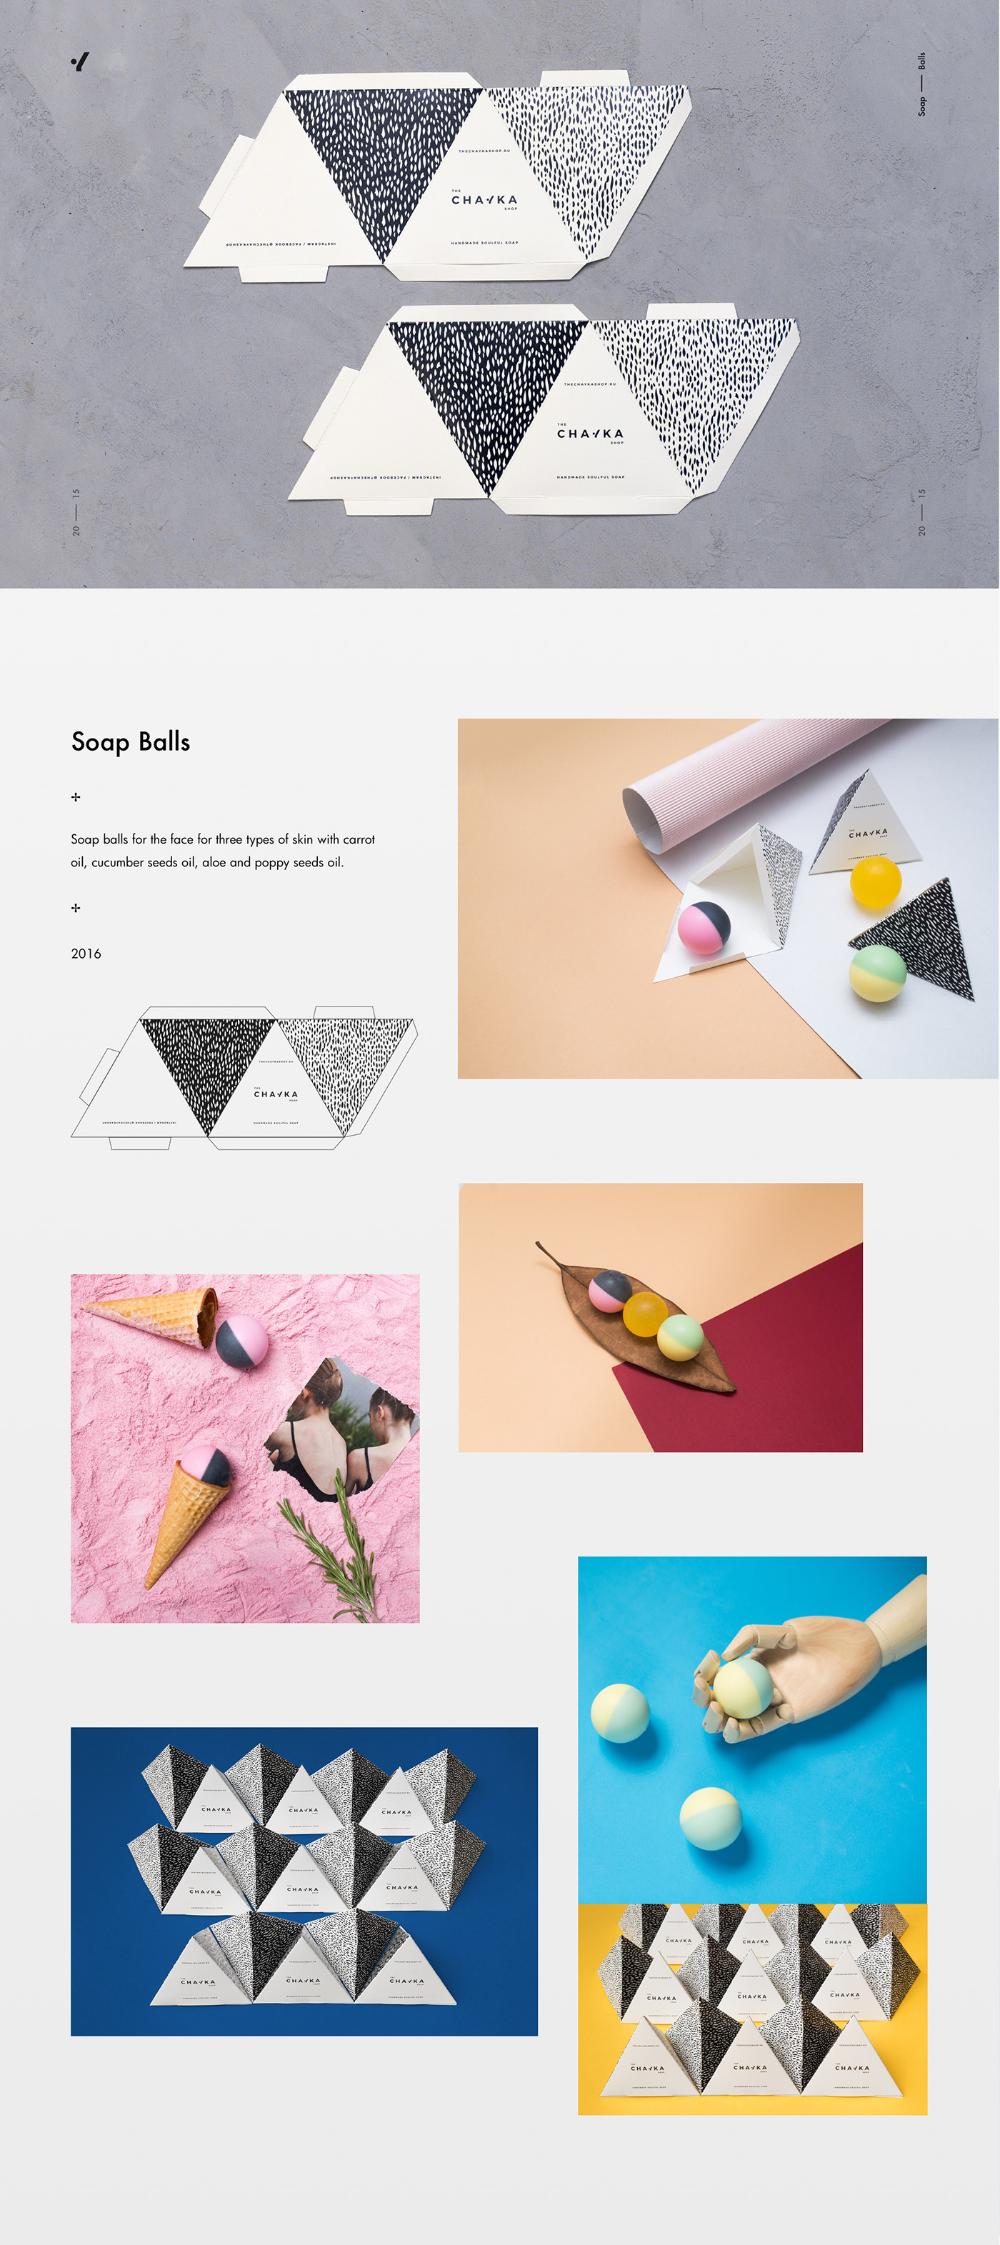 The Chayka Shop On Behance Design Print Layout Print Layout Geometric Shapes